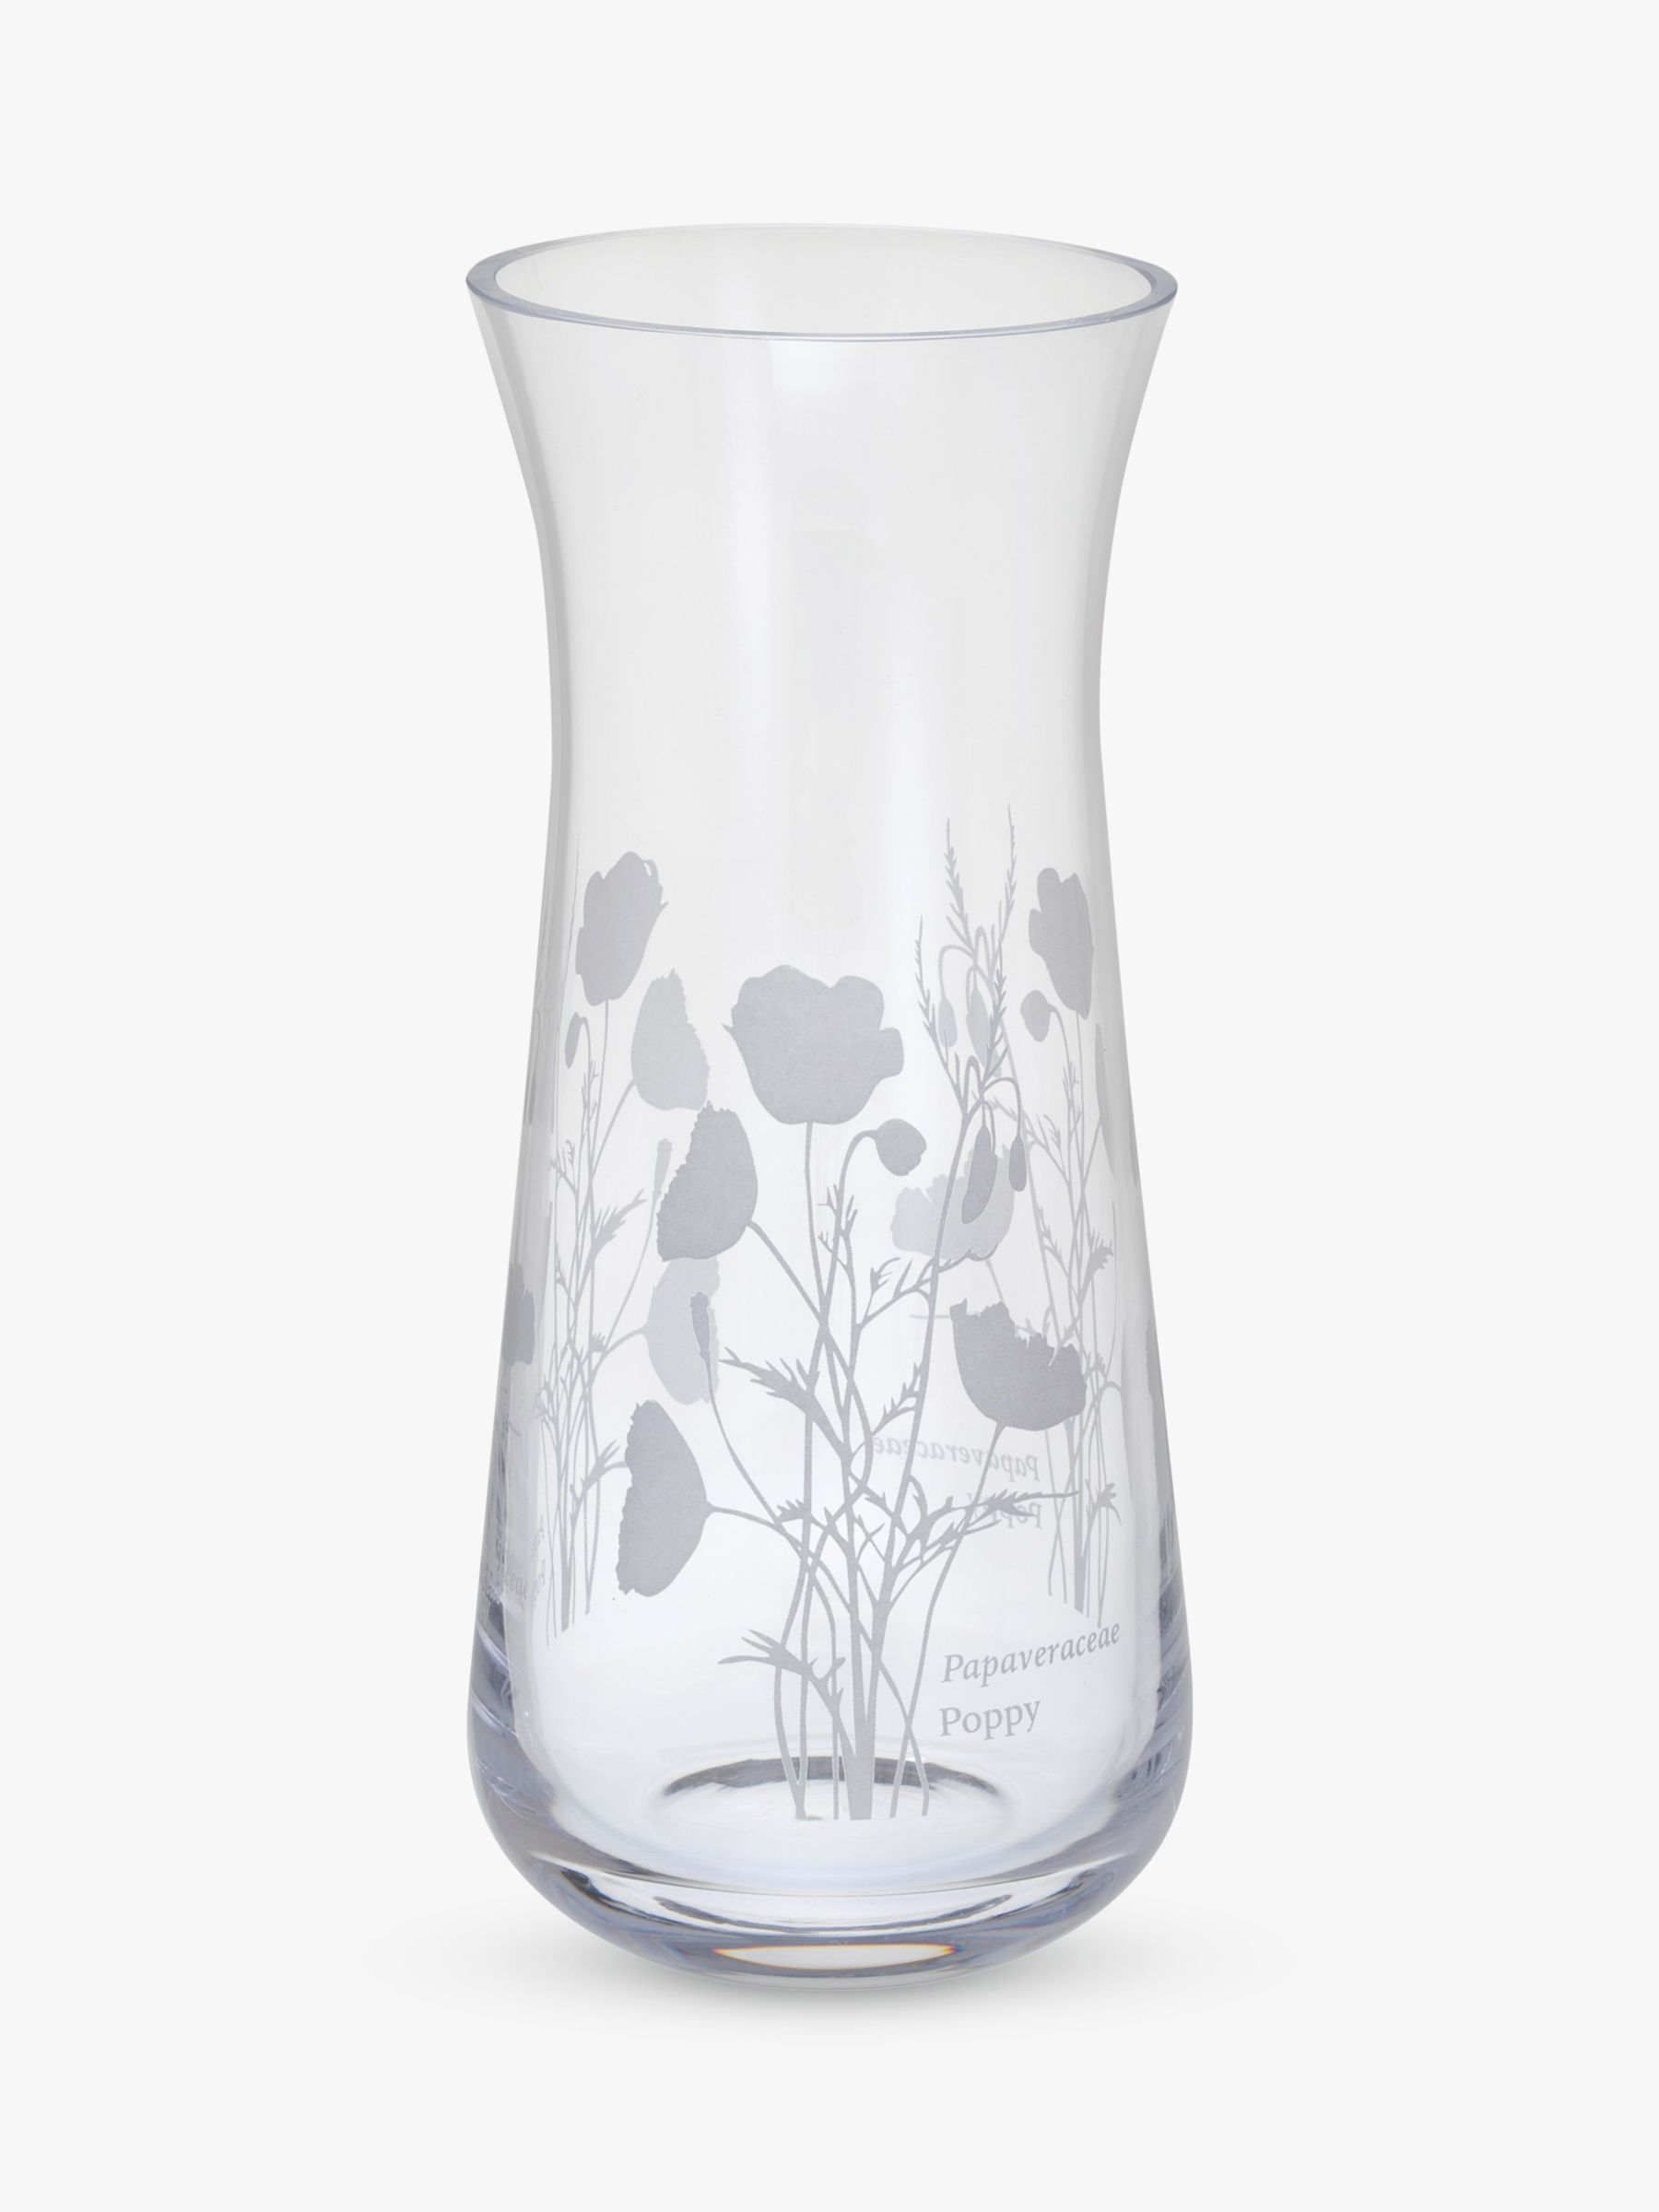 Dartington Crystal Dartington Crystal Bloom Poppy Vase, H18cm